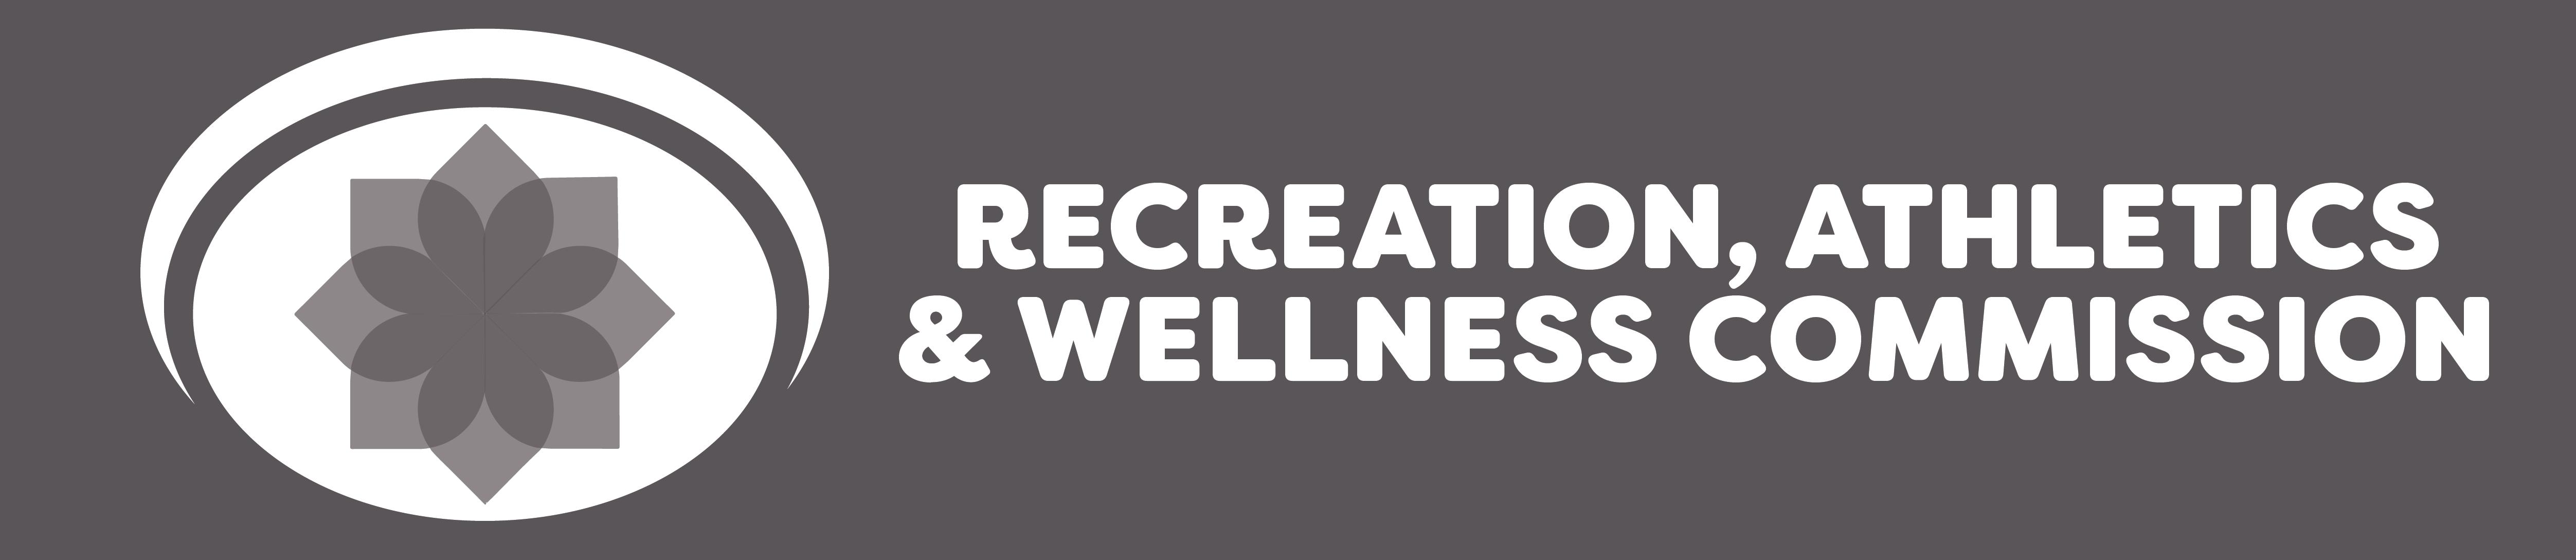 RECREATION, ATHLETICS & WELLNESS COMMISSION